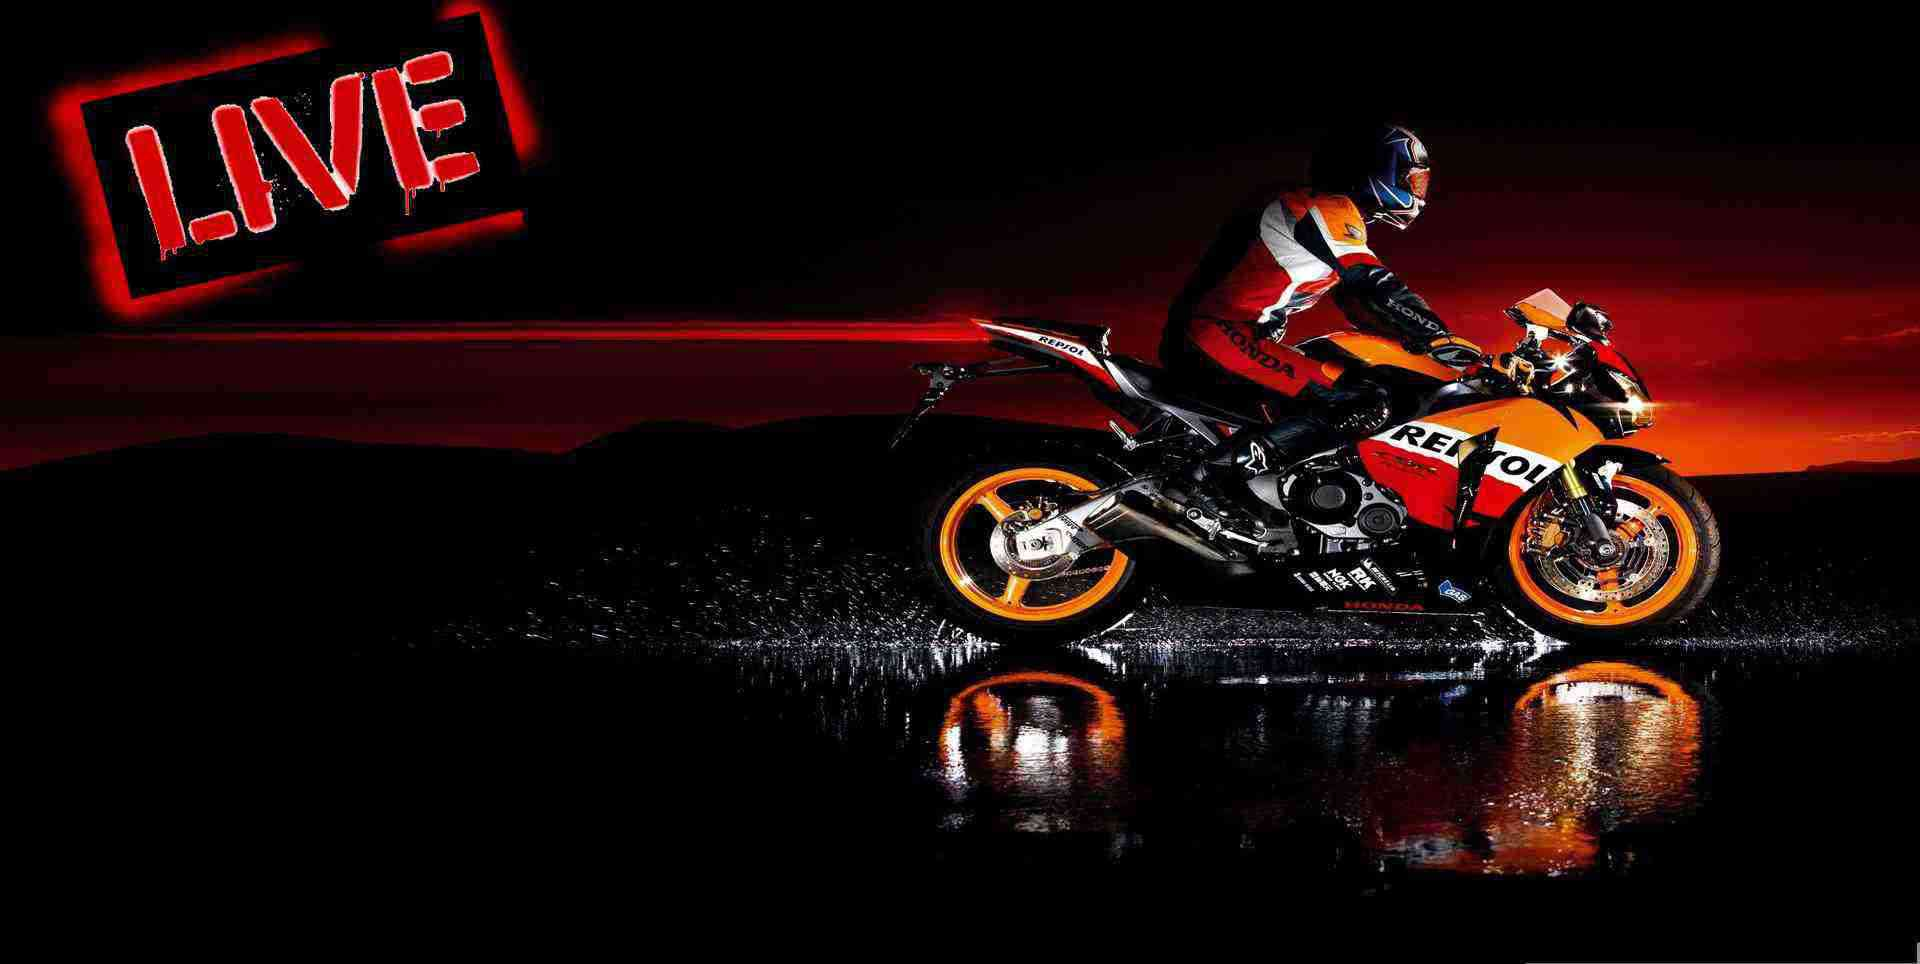 motogp-republic-grand-prix-2015-online